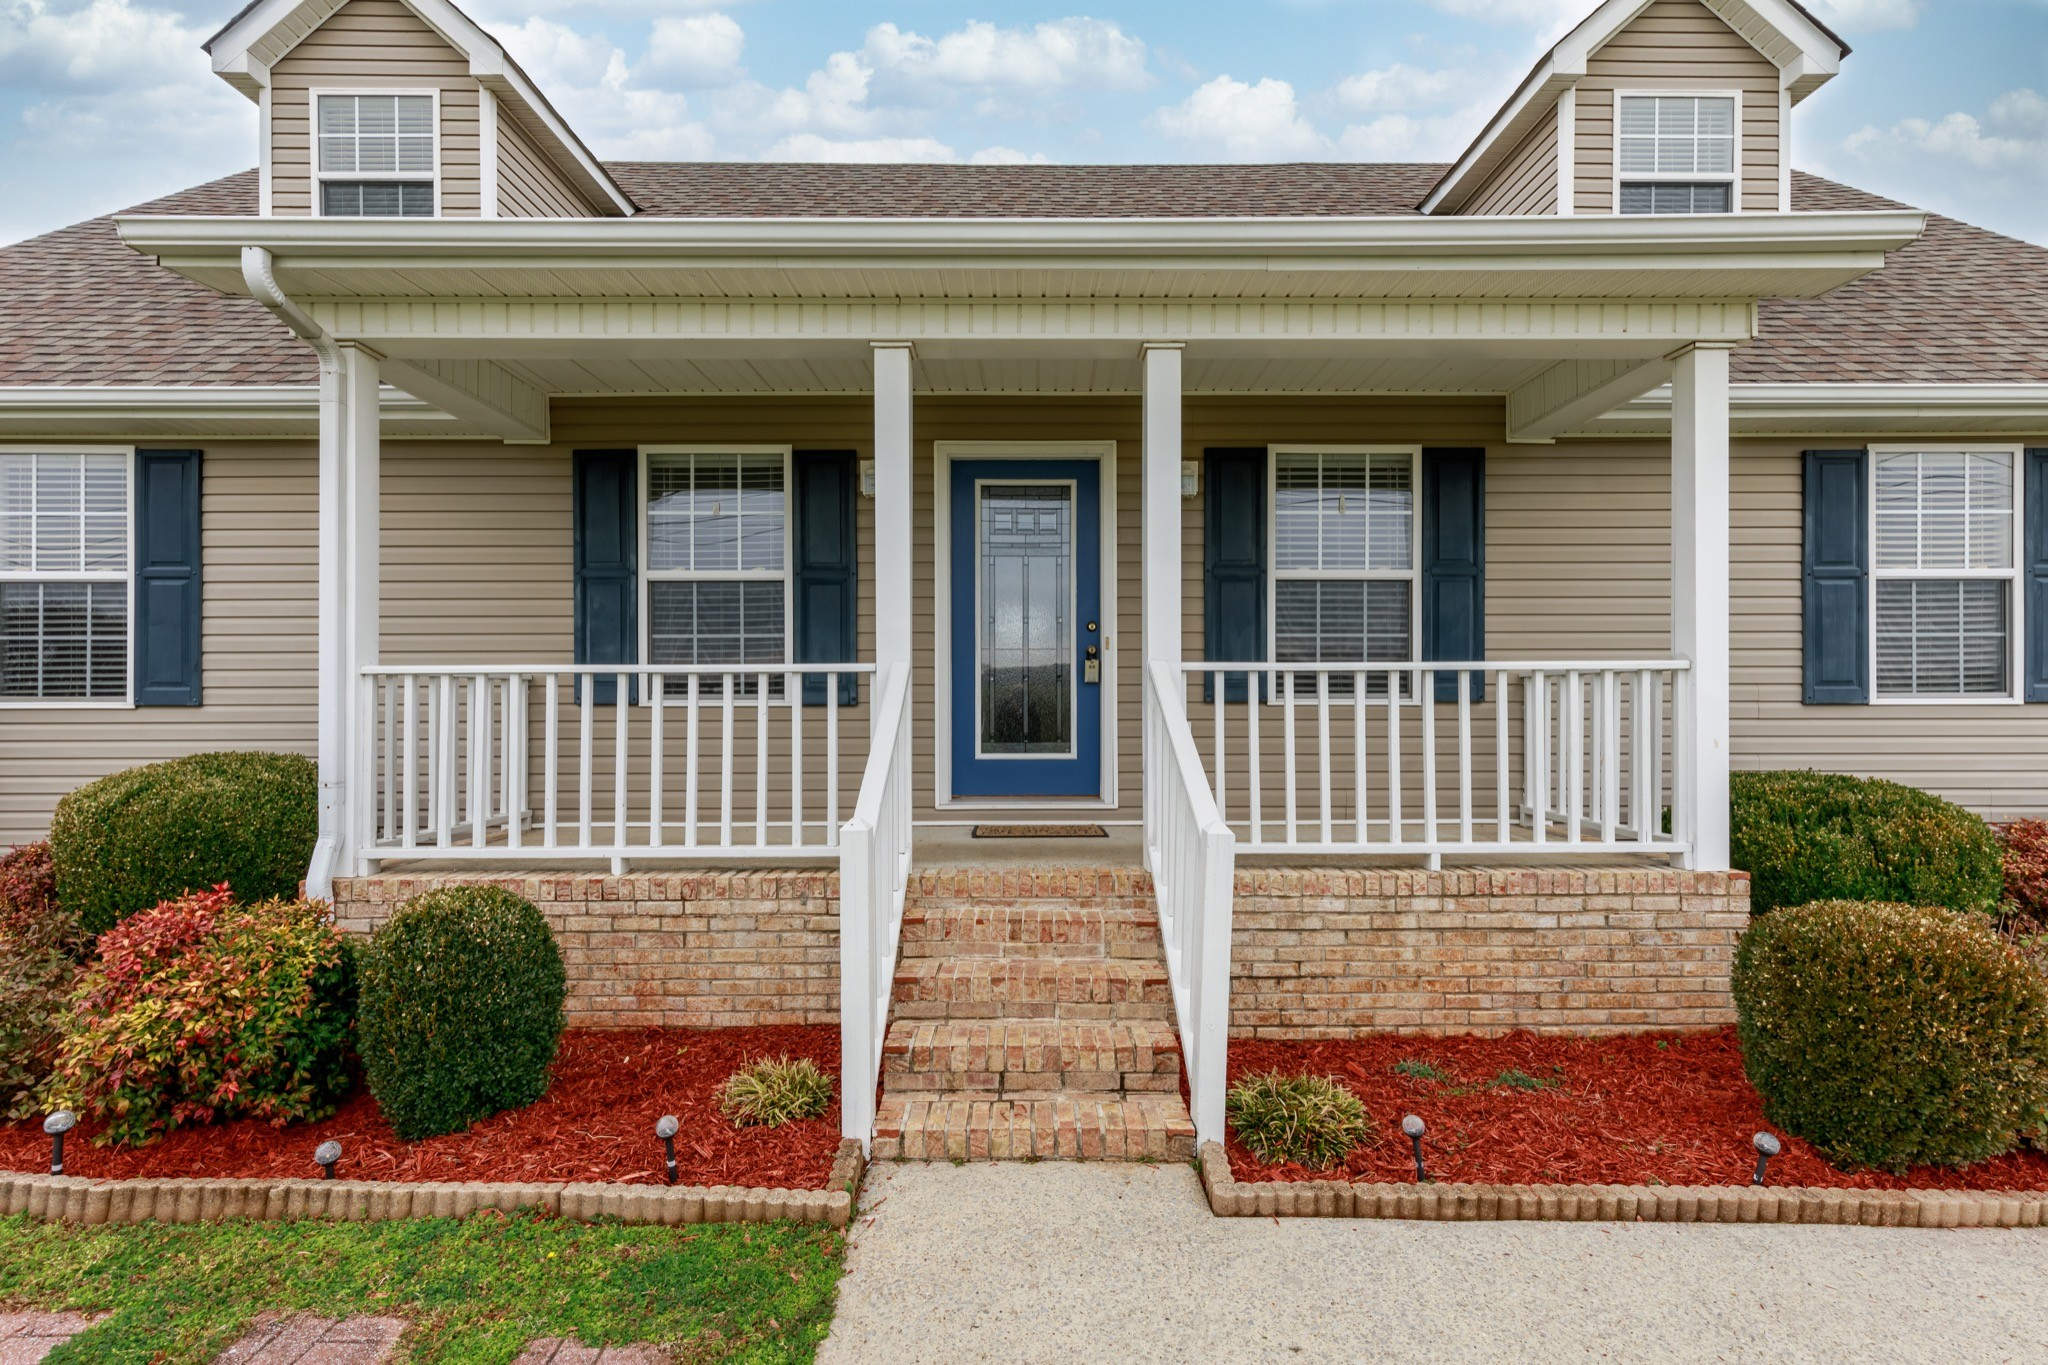 2571 Unionville Deason Rd, Bell Buckle, TN 37020 - Bell Buckle, TN real estate listing